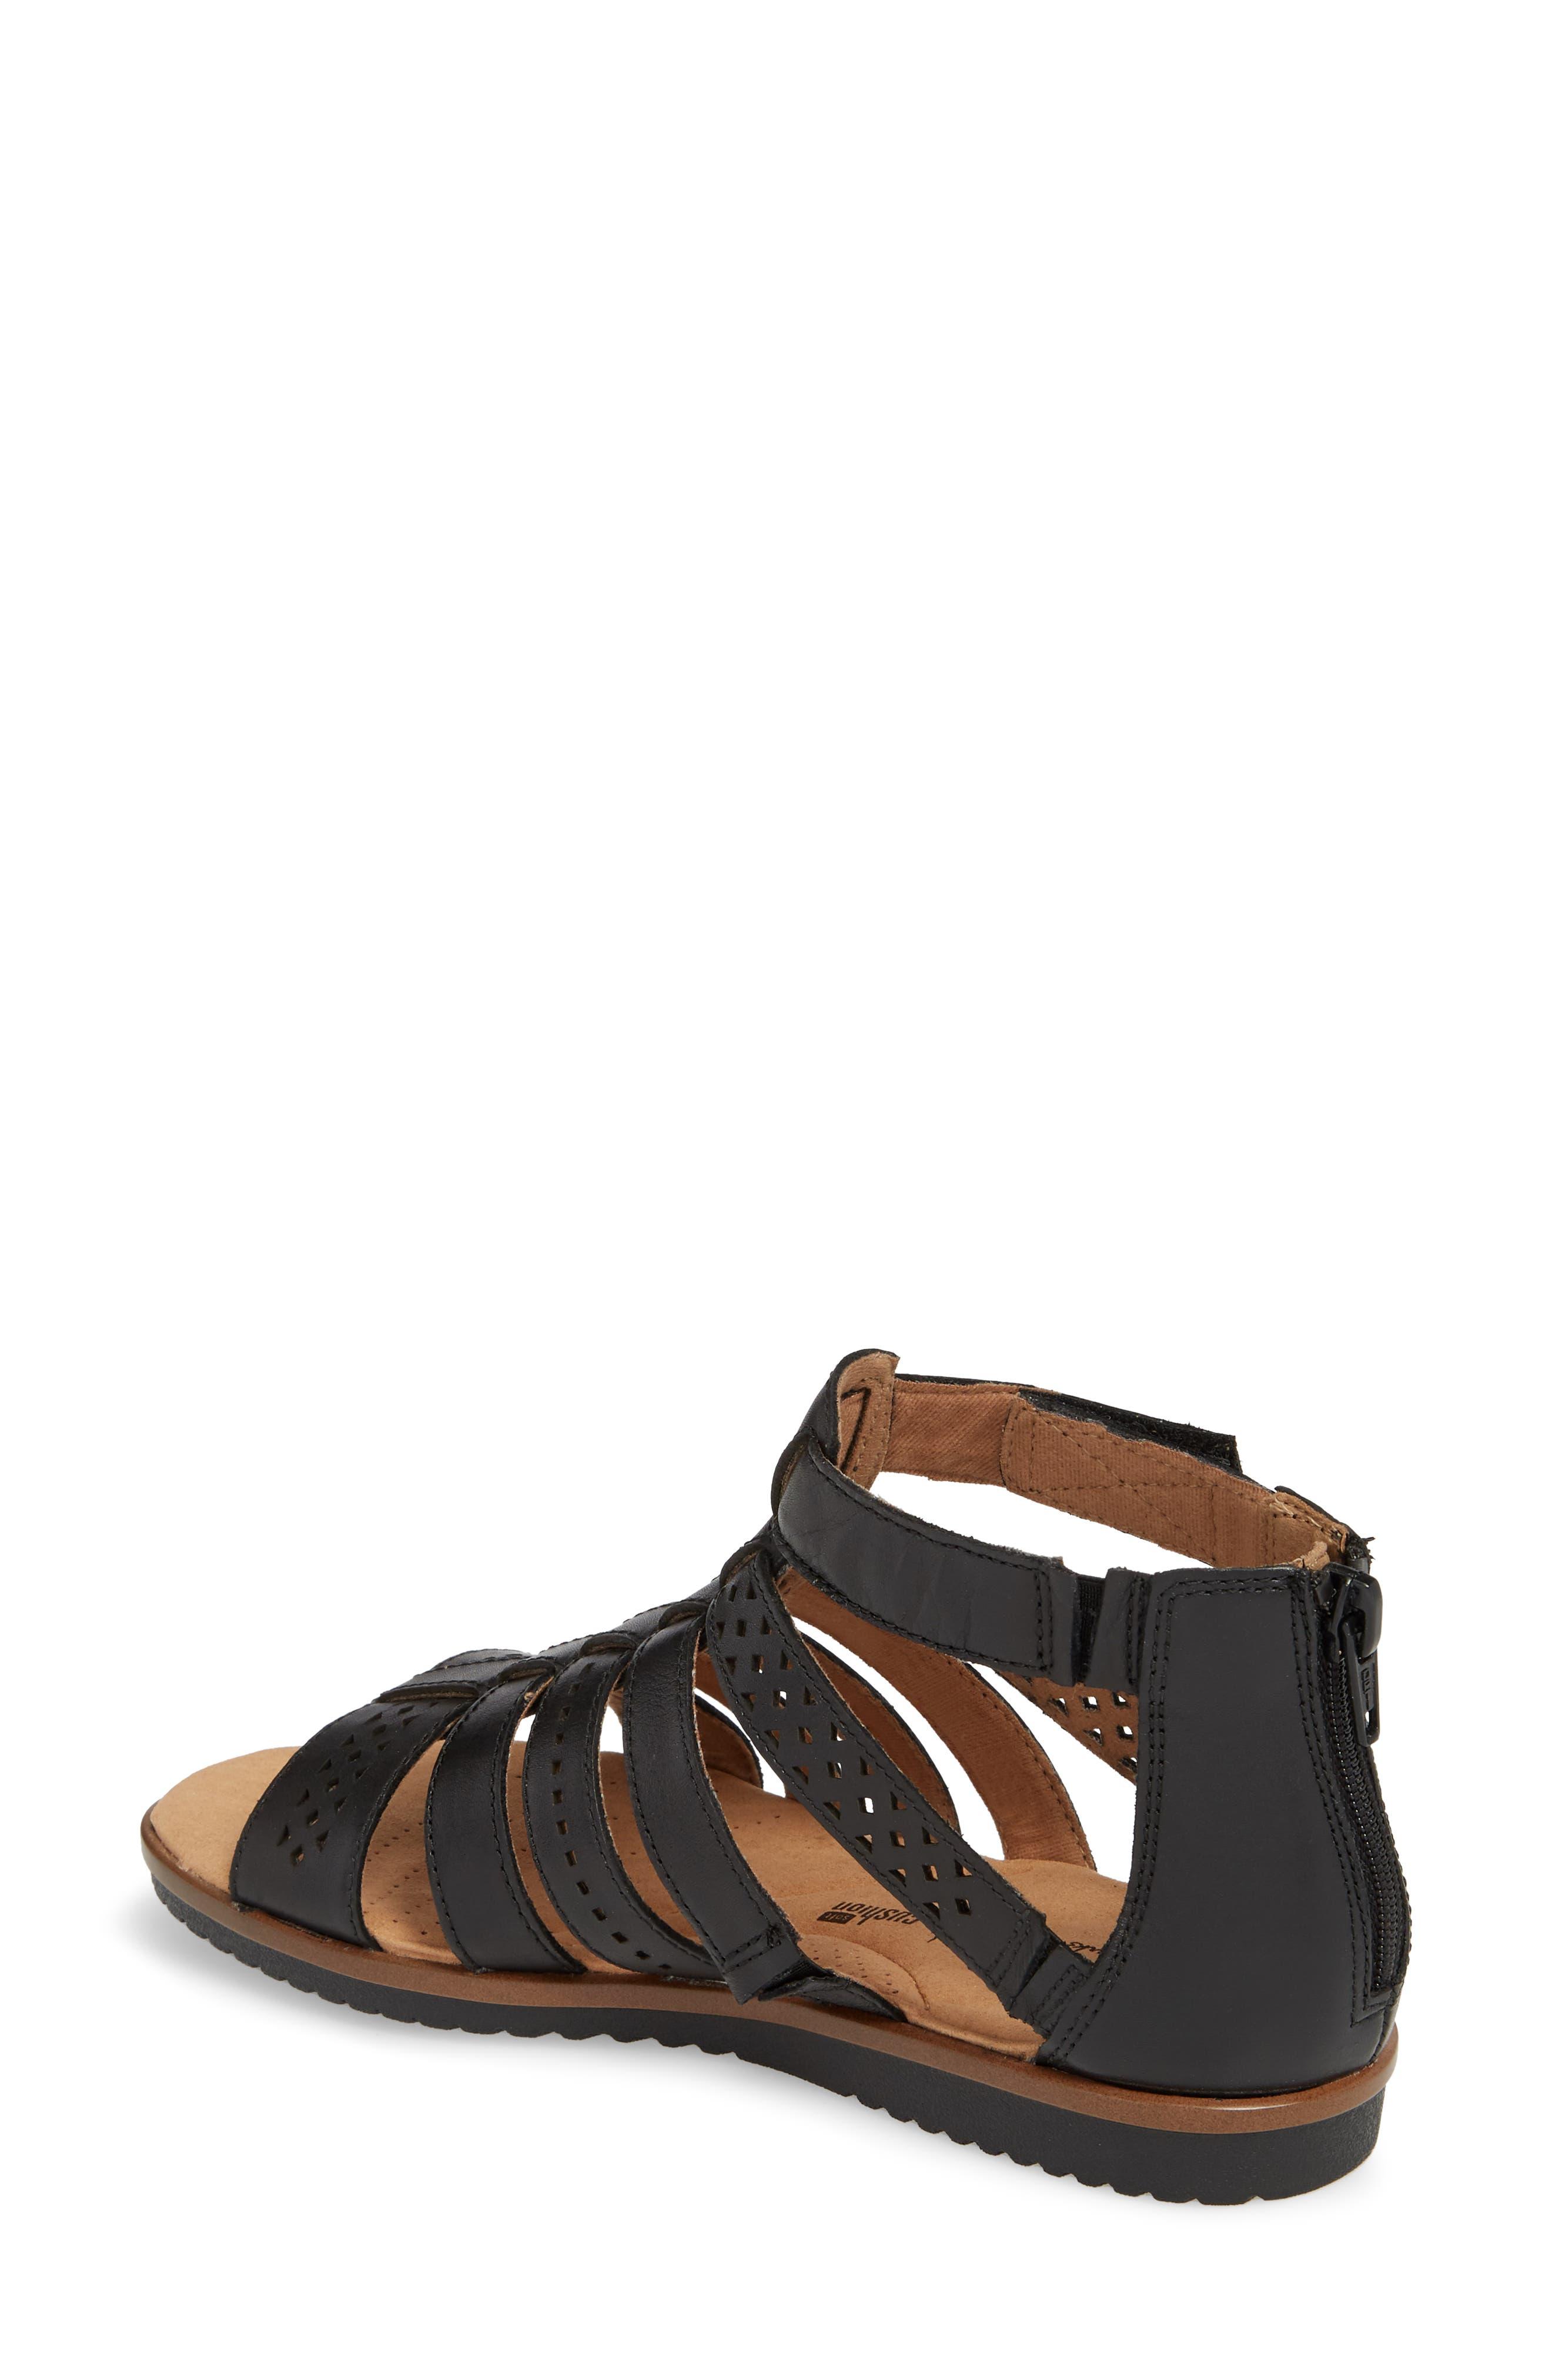 Alternate Image 2  - Clarks® Kele Lotus Sandal (Women)